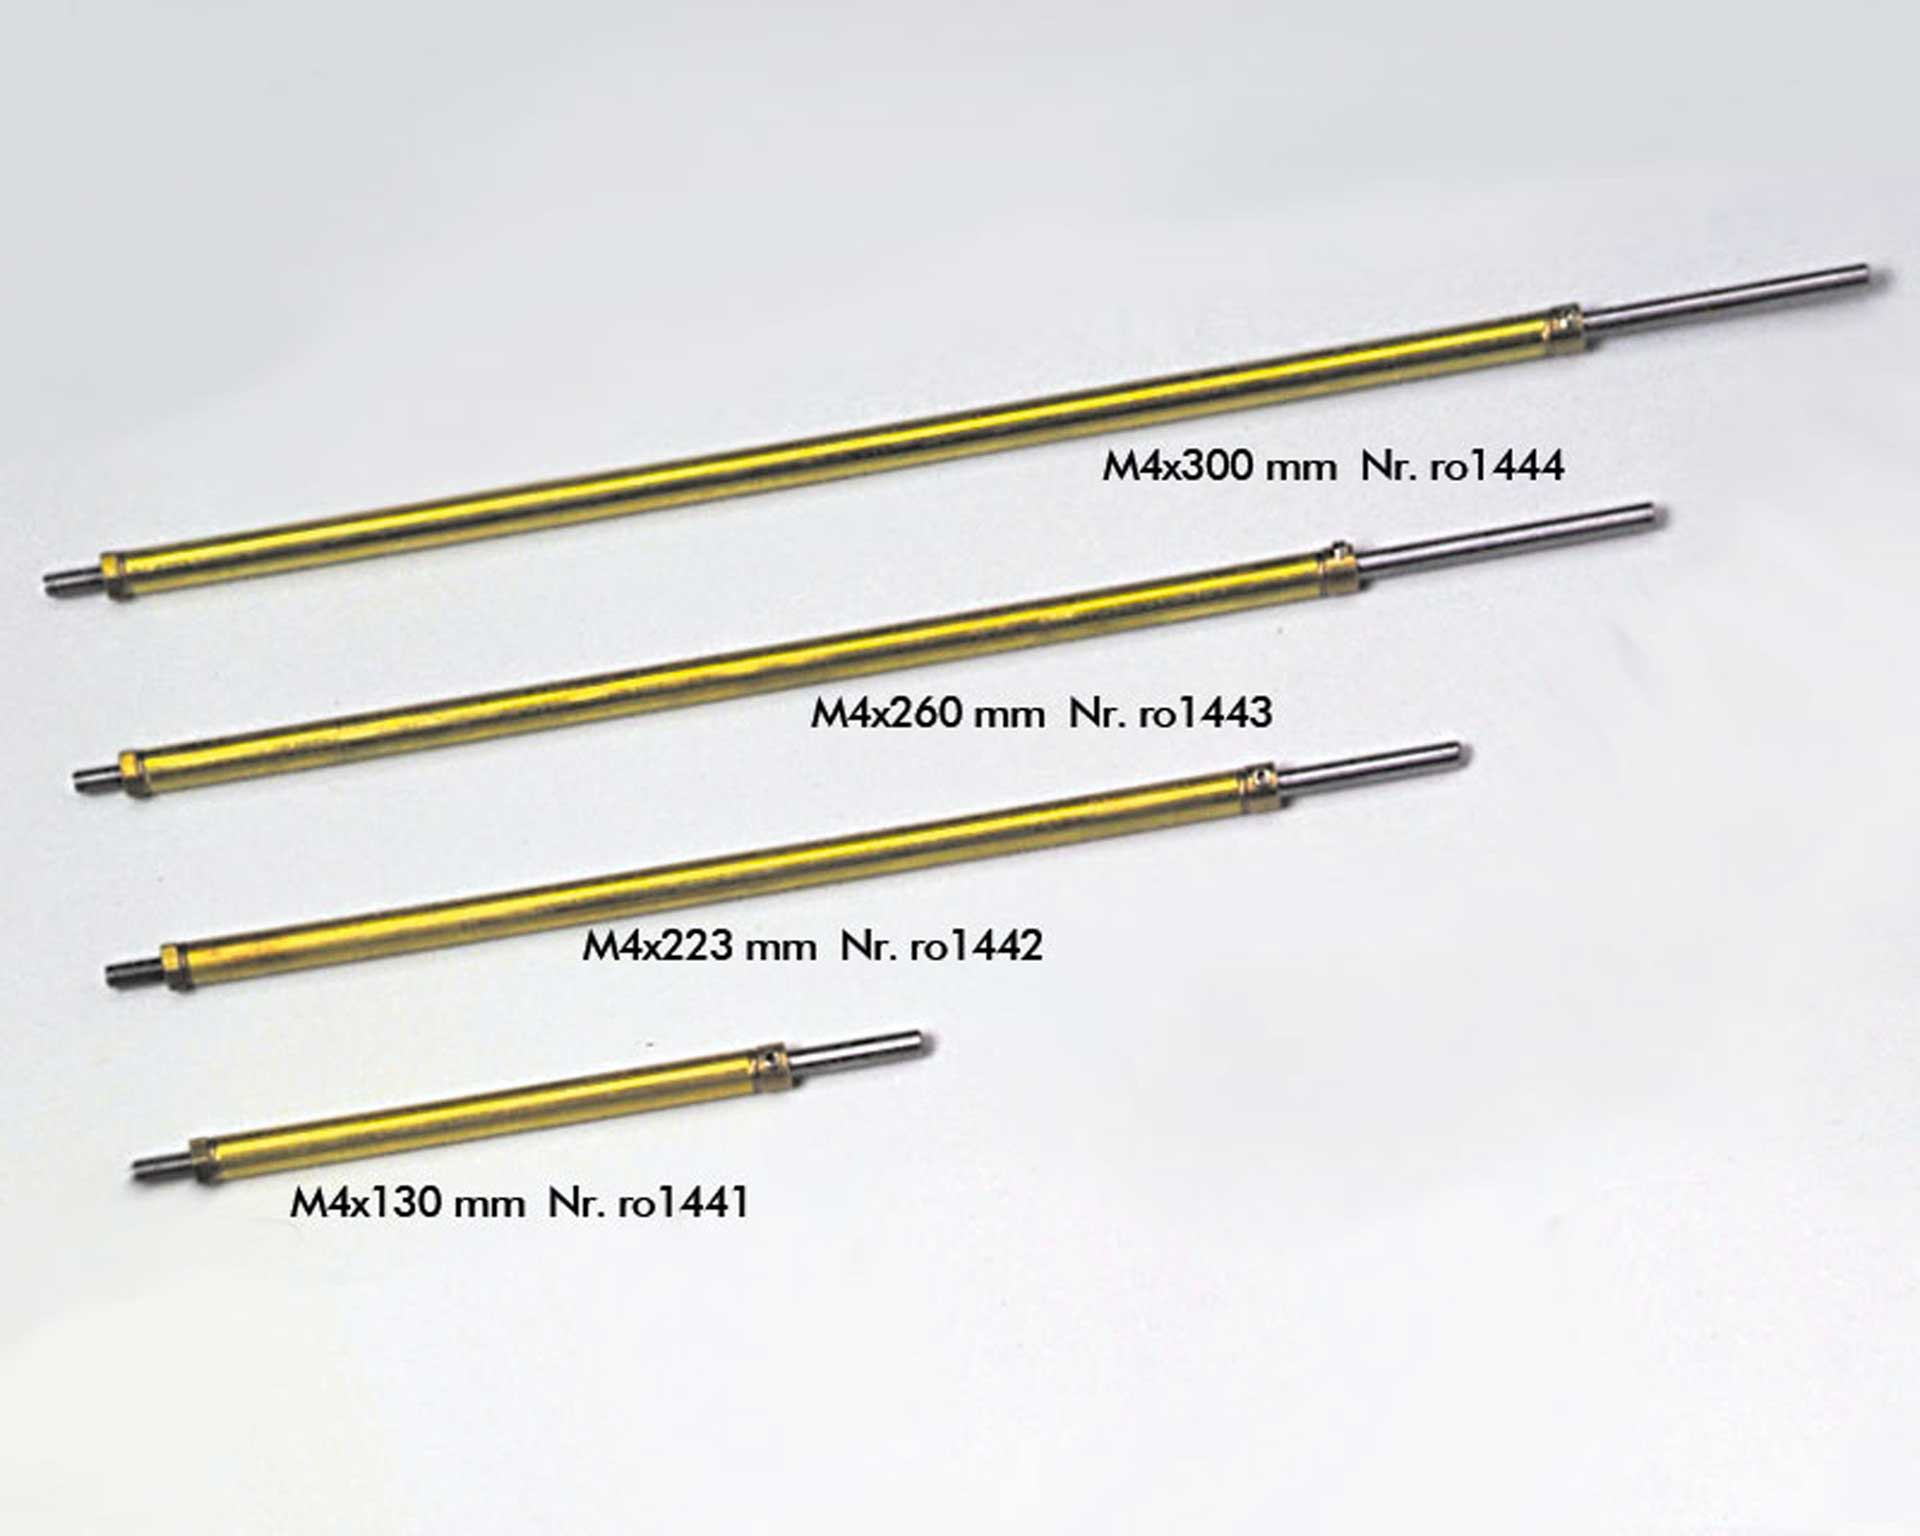 ROMARIN Sterntube 175 + shaft M4x223mm